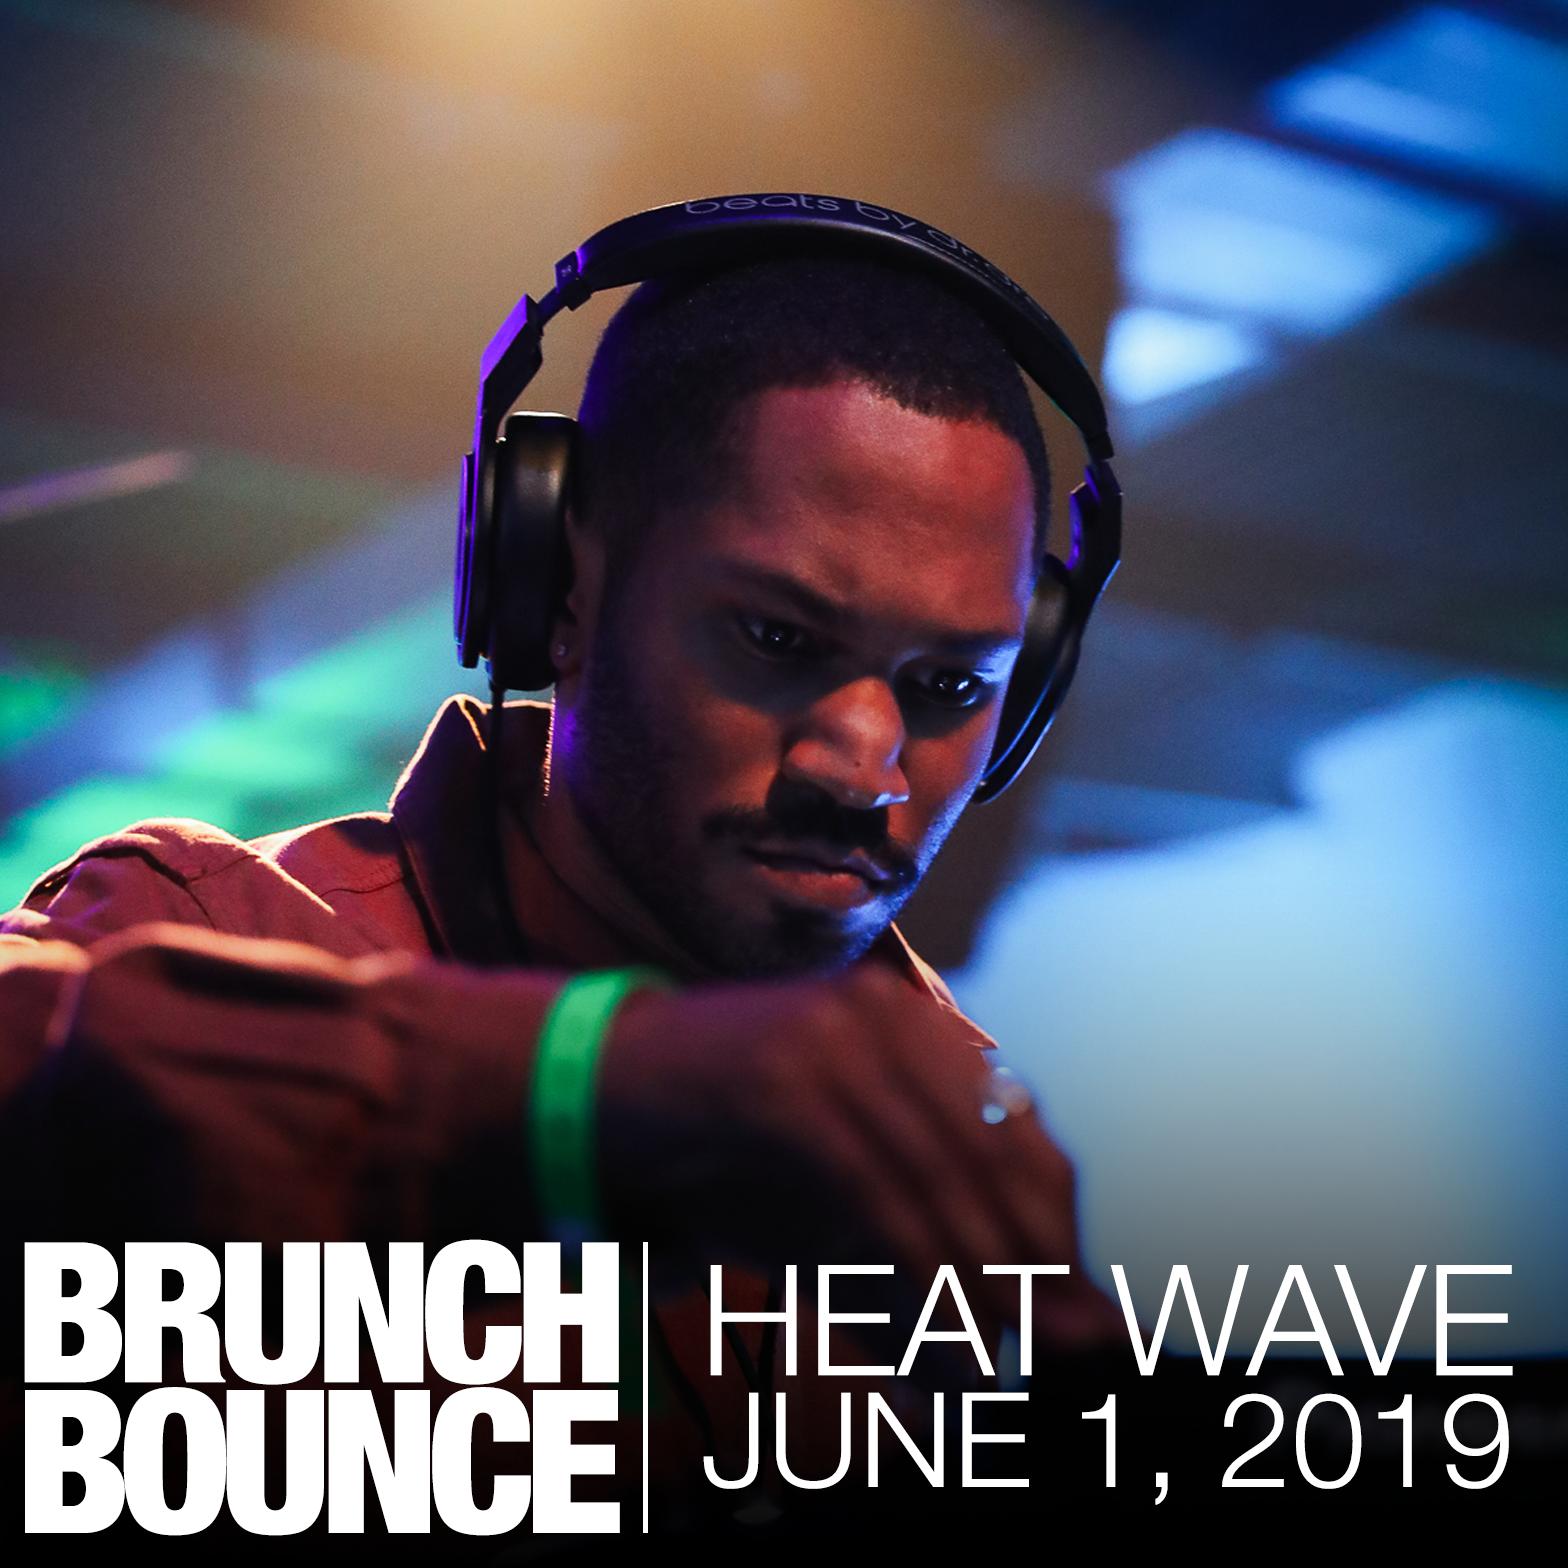 Heat Wave 6.1.19